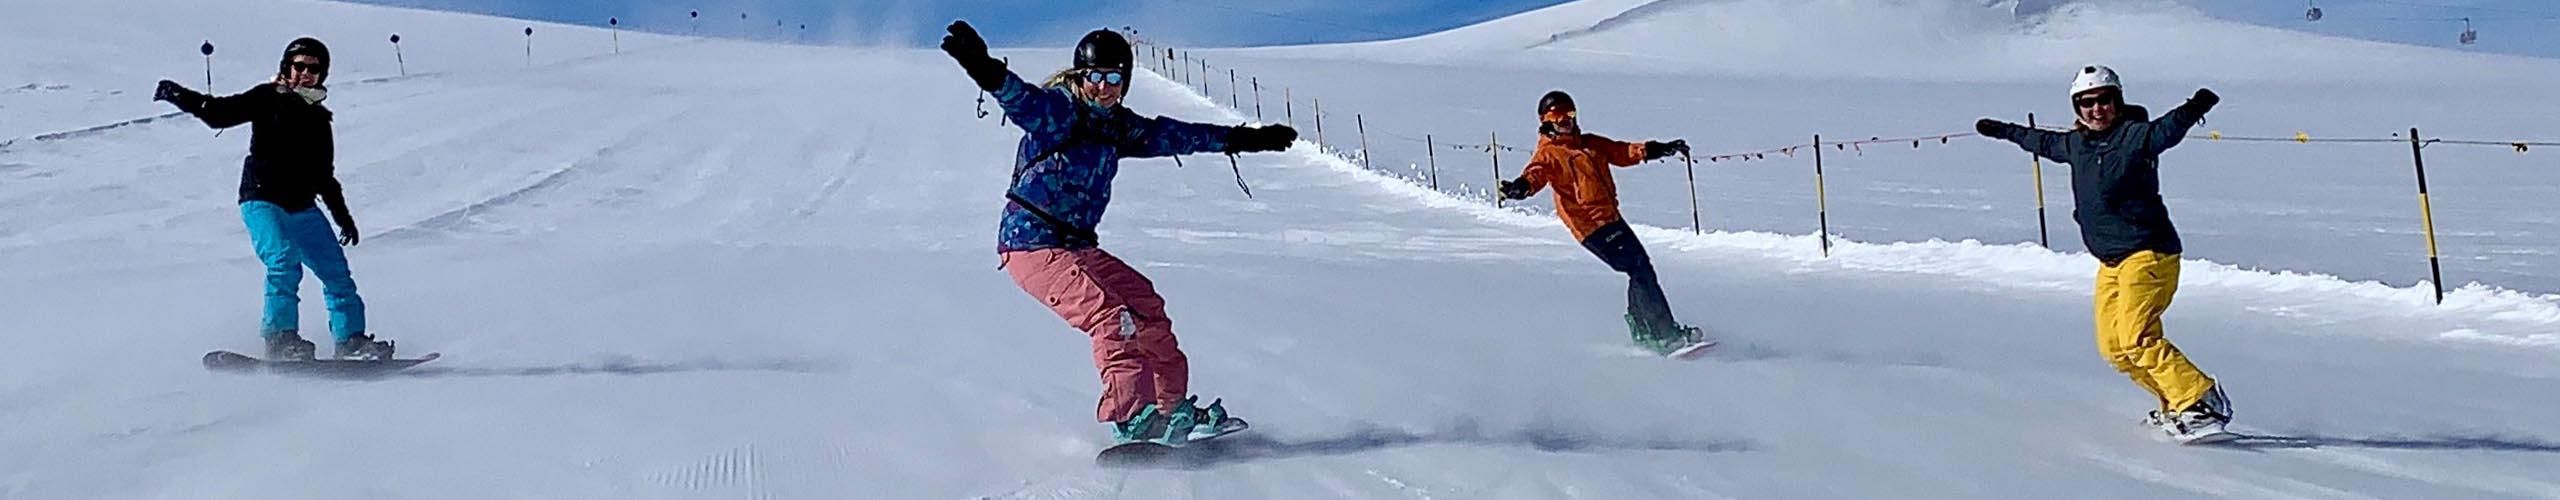 Skiclub Worms Wonnegau